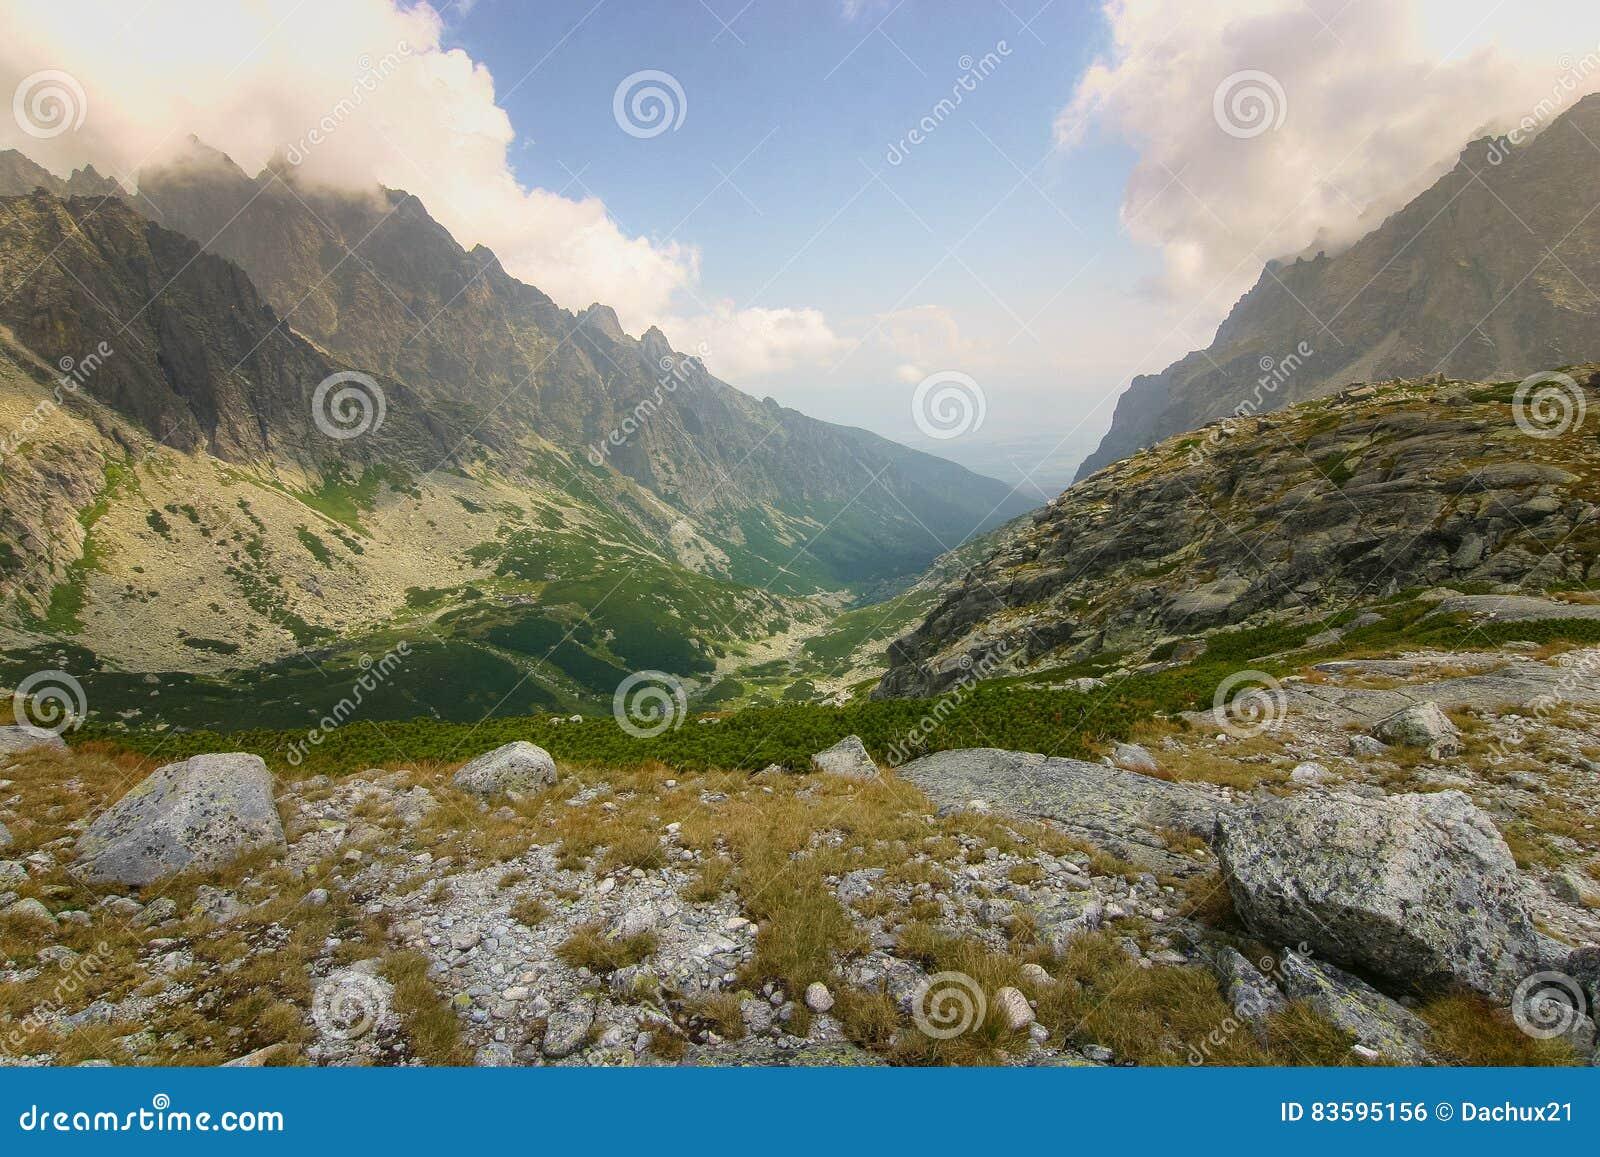 A beautiful mountain landscape above tree line